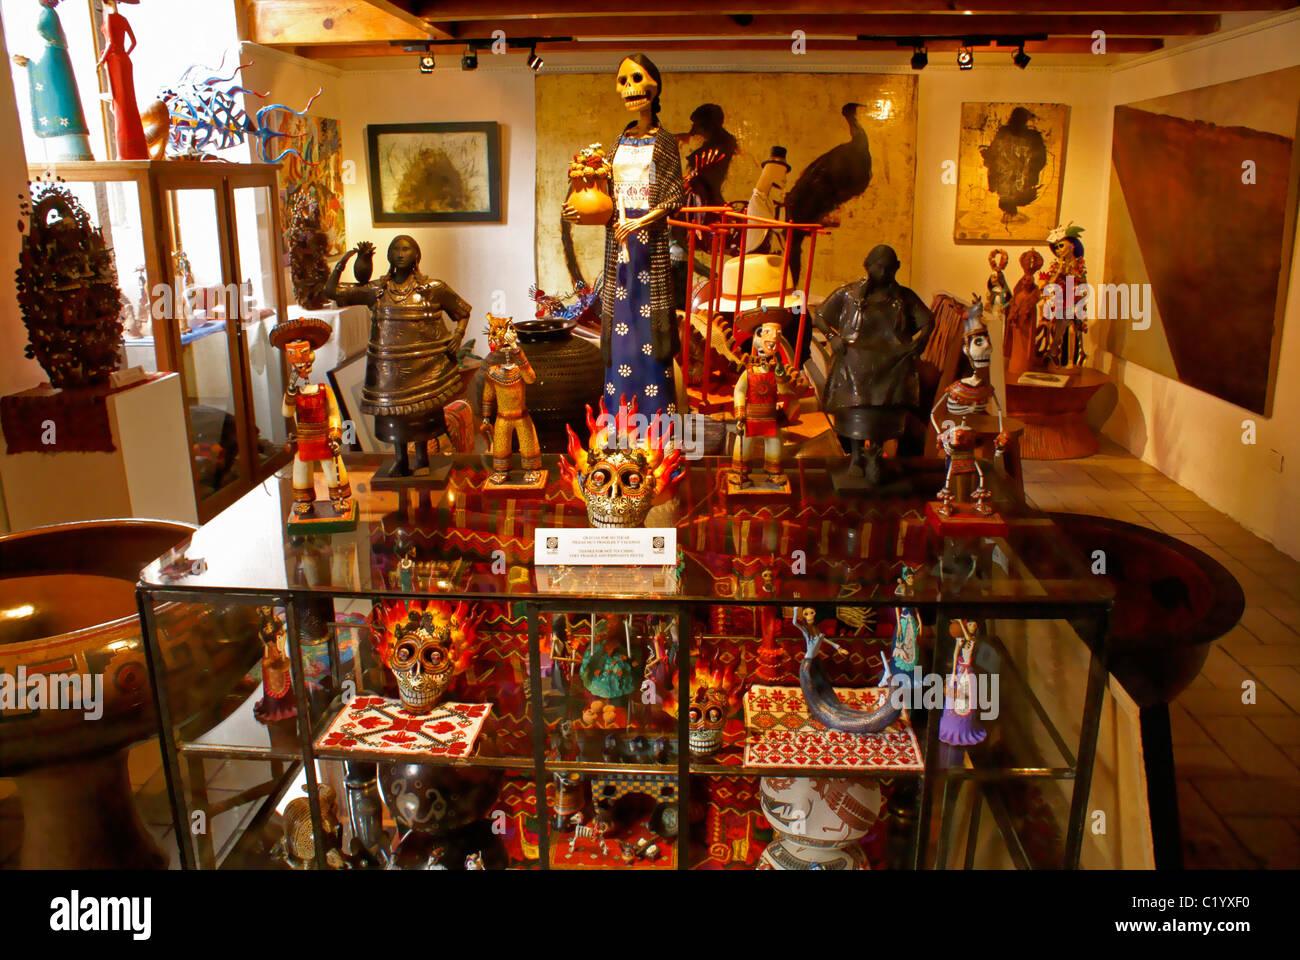 Interior of a high-end Mexican folk art in a gallery in San Miguel de Allende, Guanajuato, Mexico - Stock Image